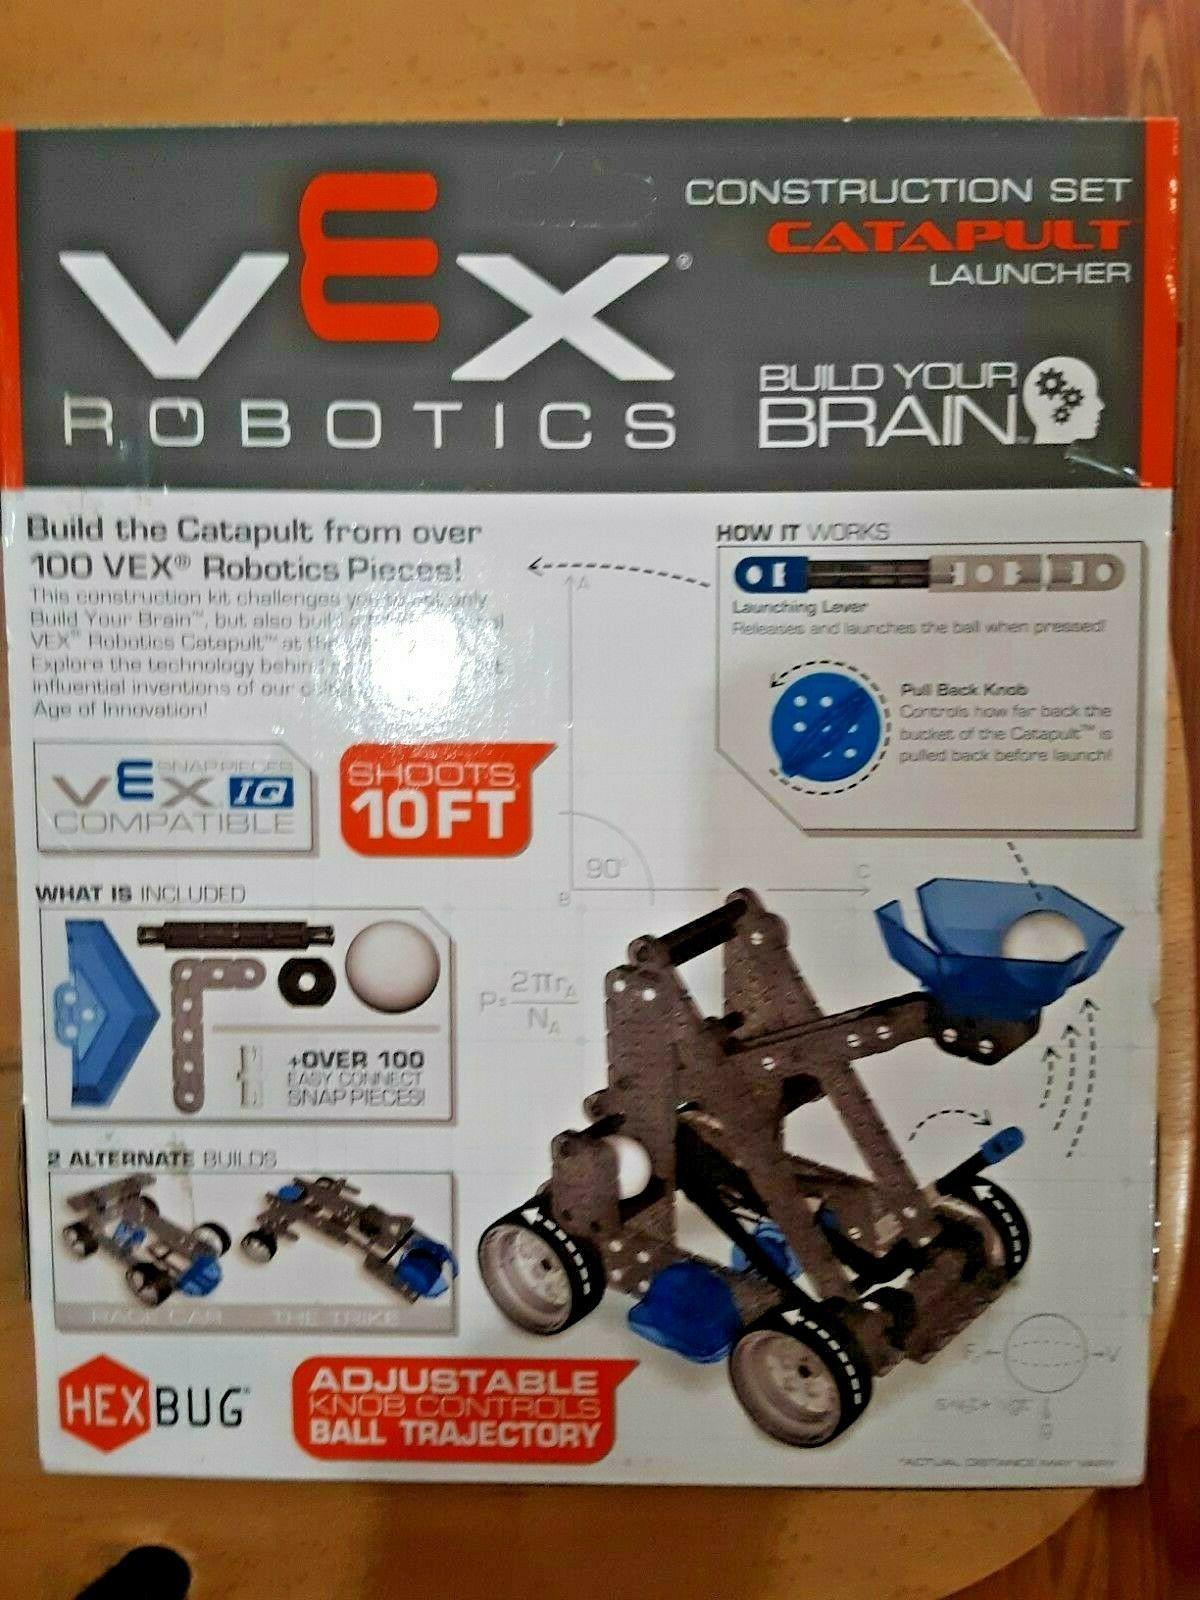 SALE! HEXBUG VEX Robotics Catapult Launcher 3-Builds STEM Starter Kit 115 Pcs